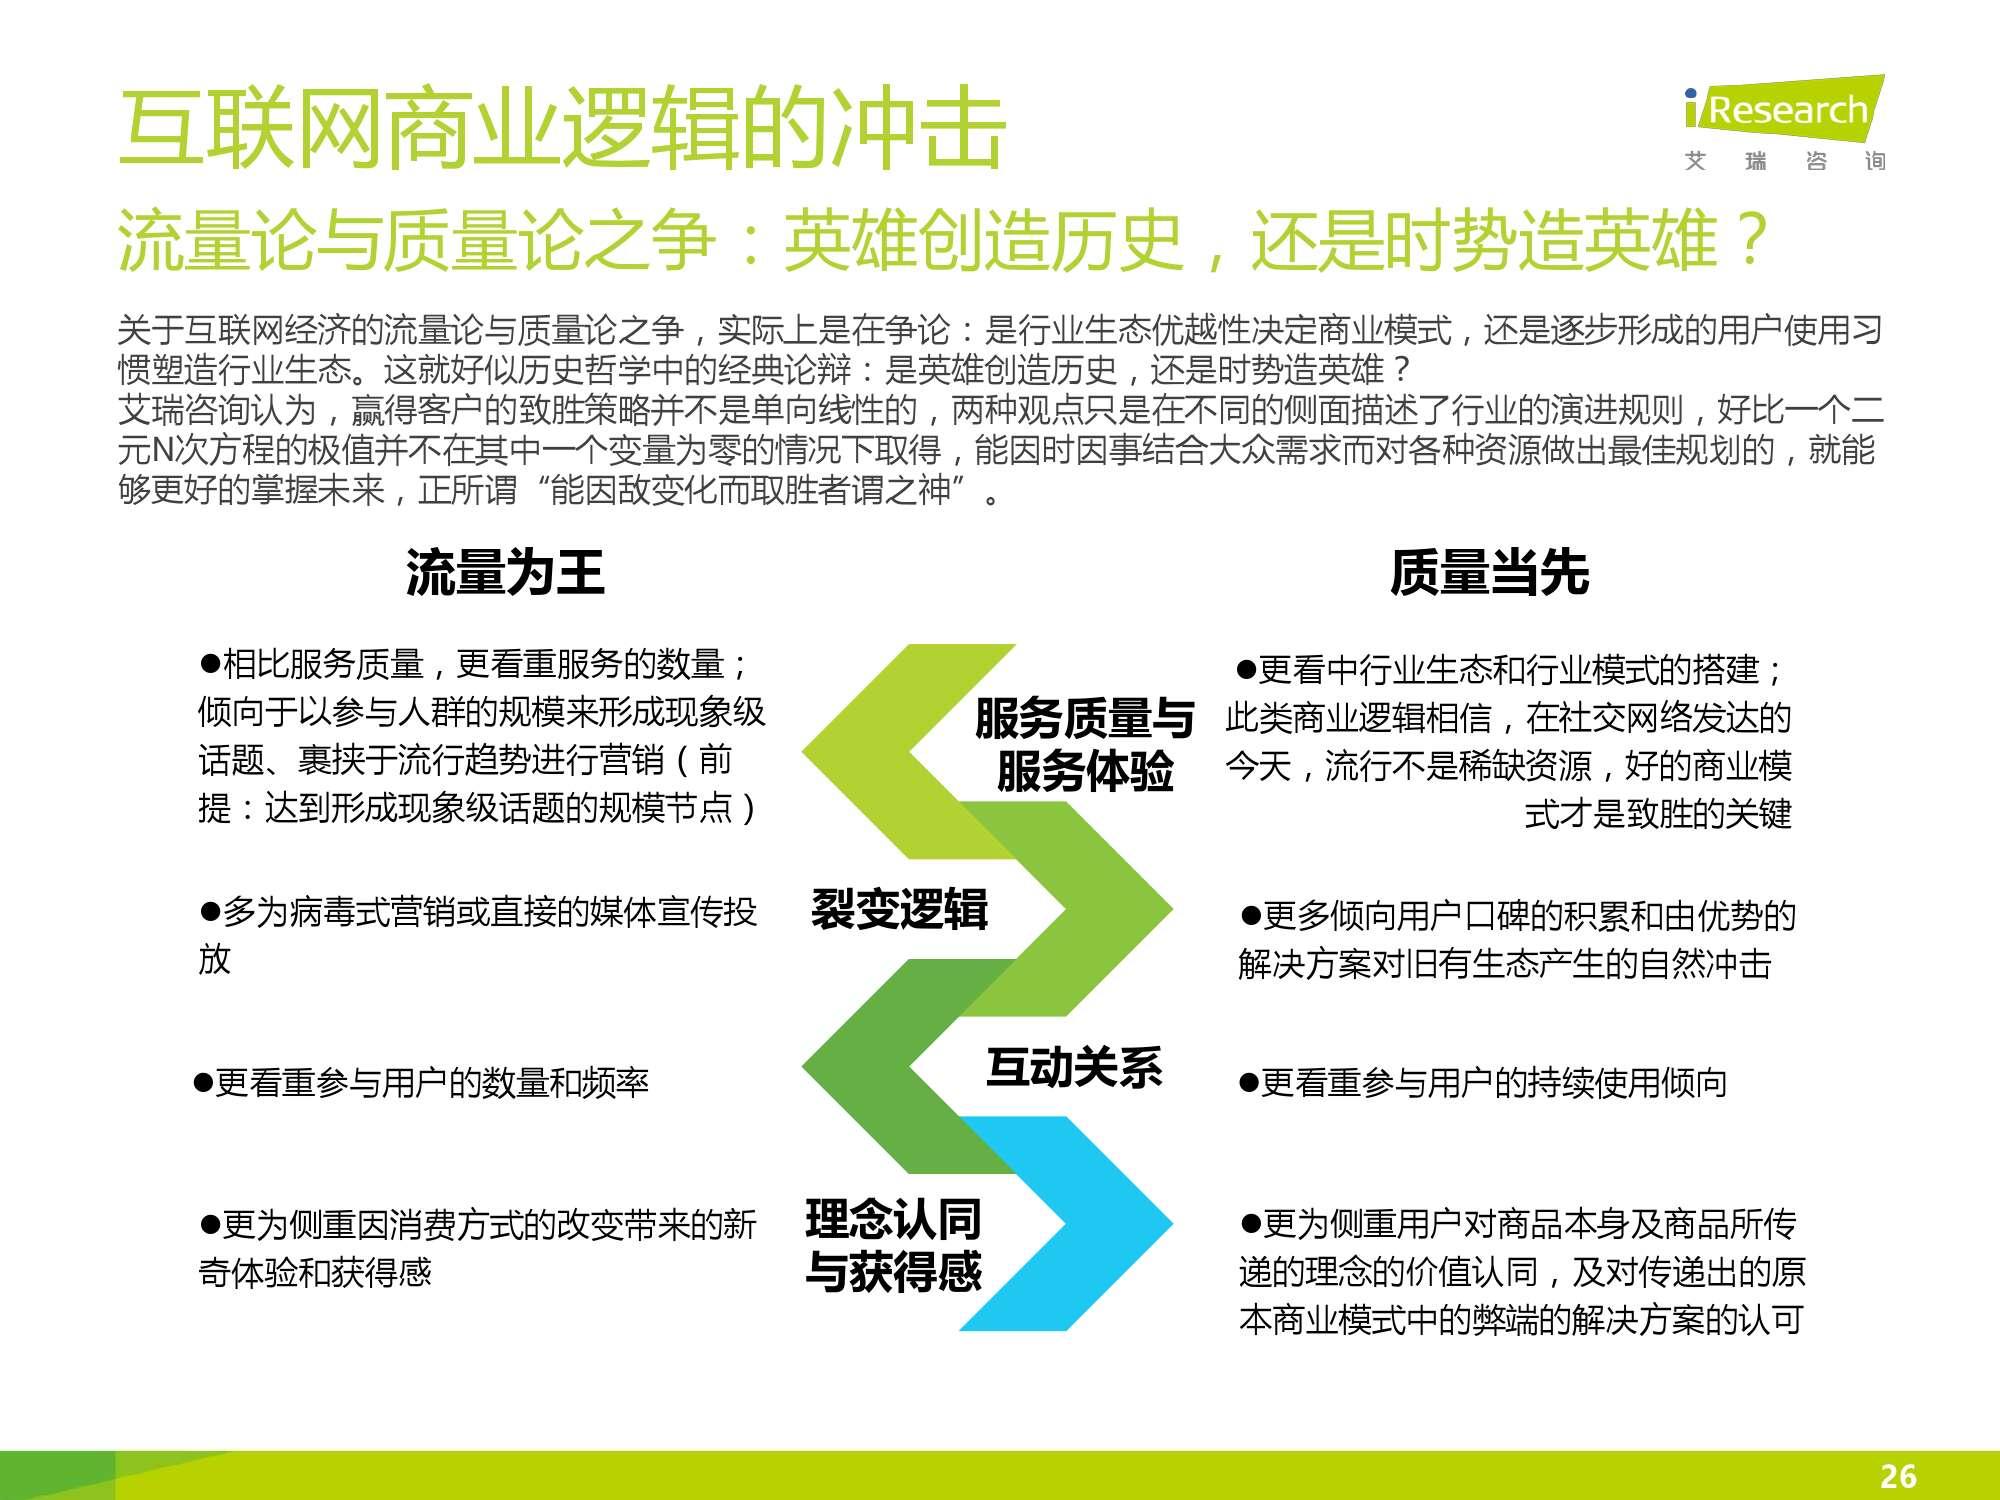 iResearch-2016年中国互联网消费金融市场研究报告_000026